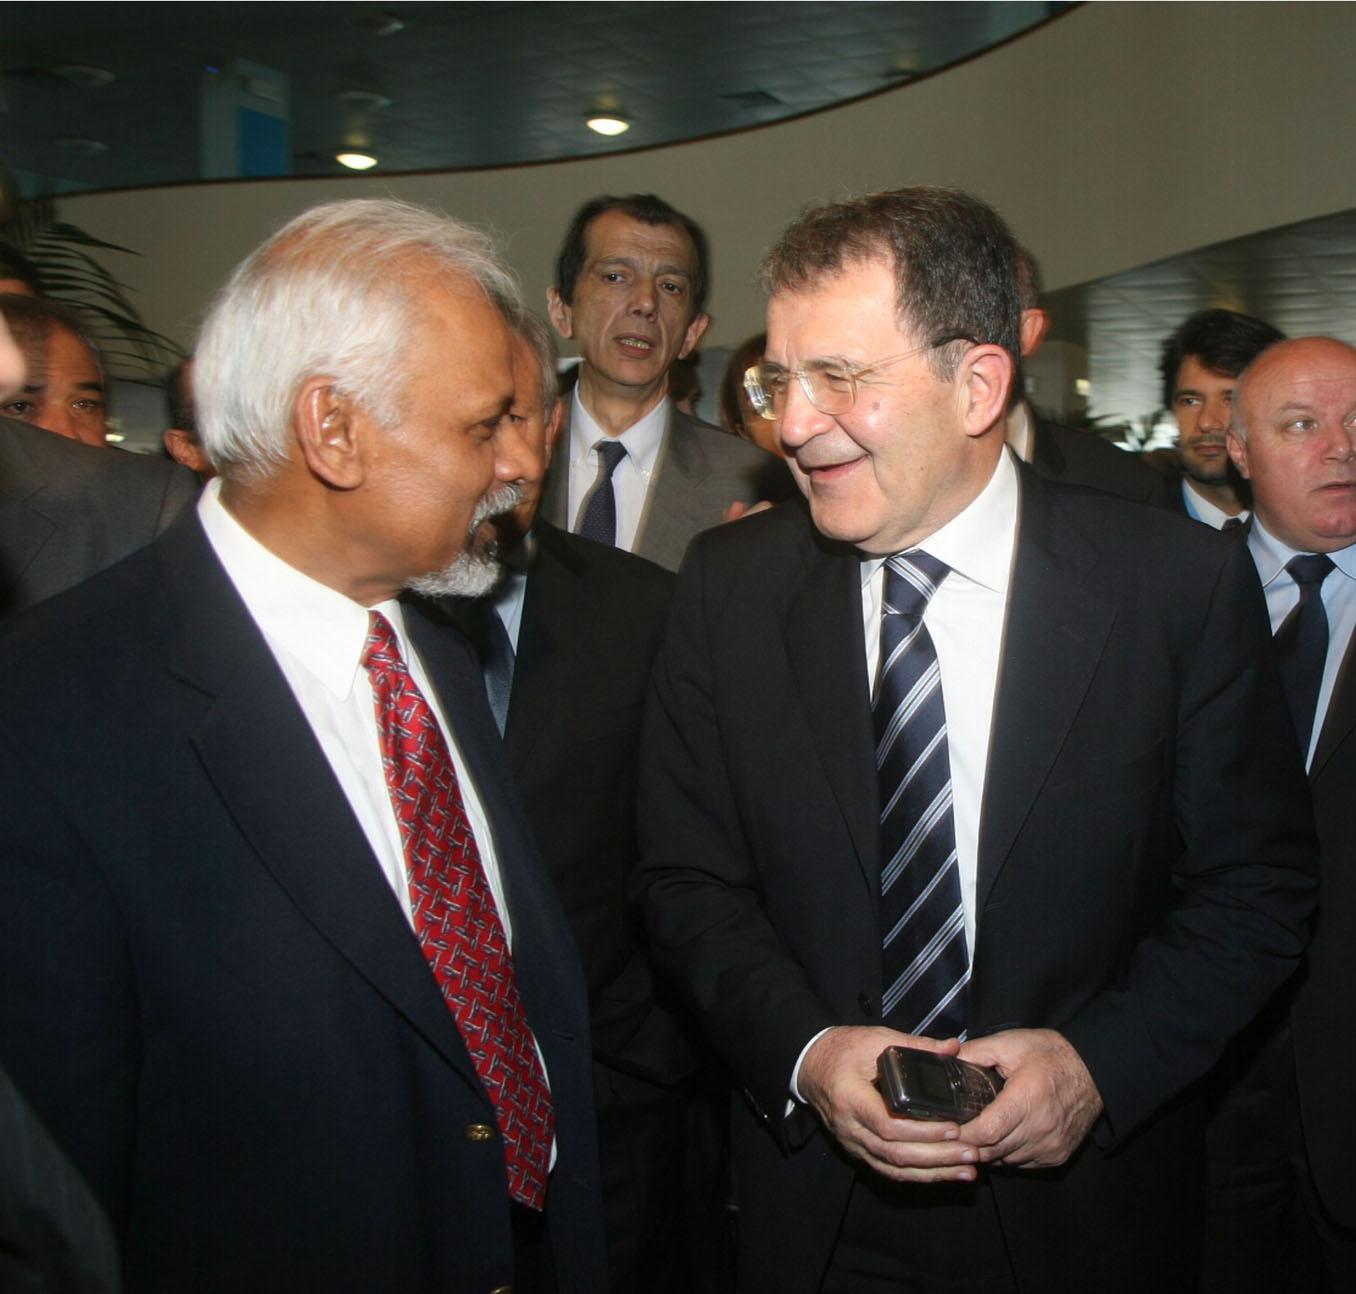 K.R. Sreenivasan, Silvio Sircana (Prodi's spokesman) and Romano Prodi, Italian Prime Minister